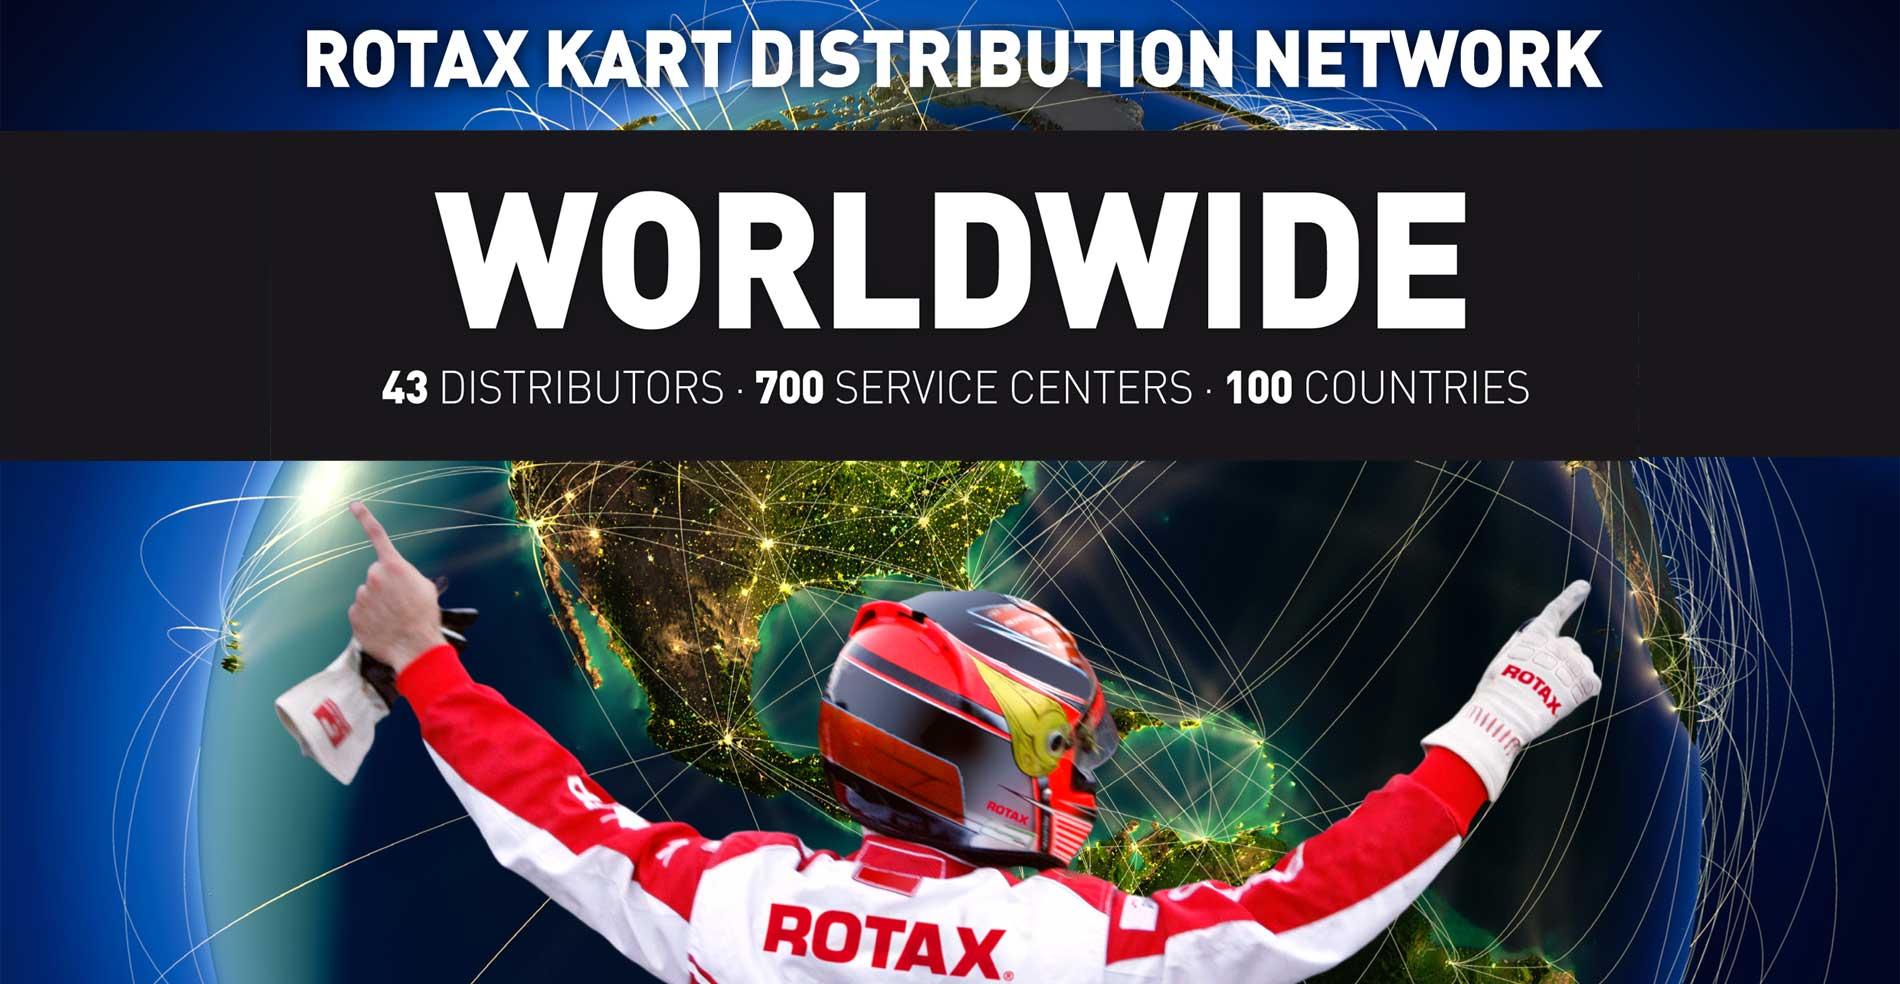 Jag Rotax – main distributor for rotax kart engines